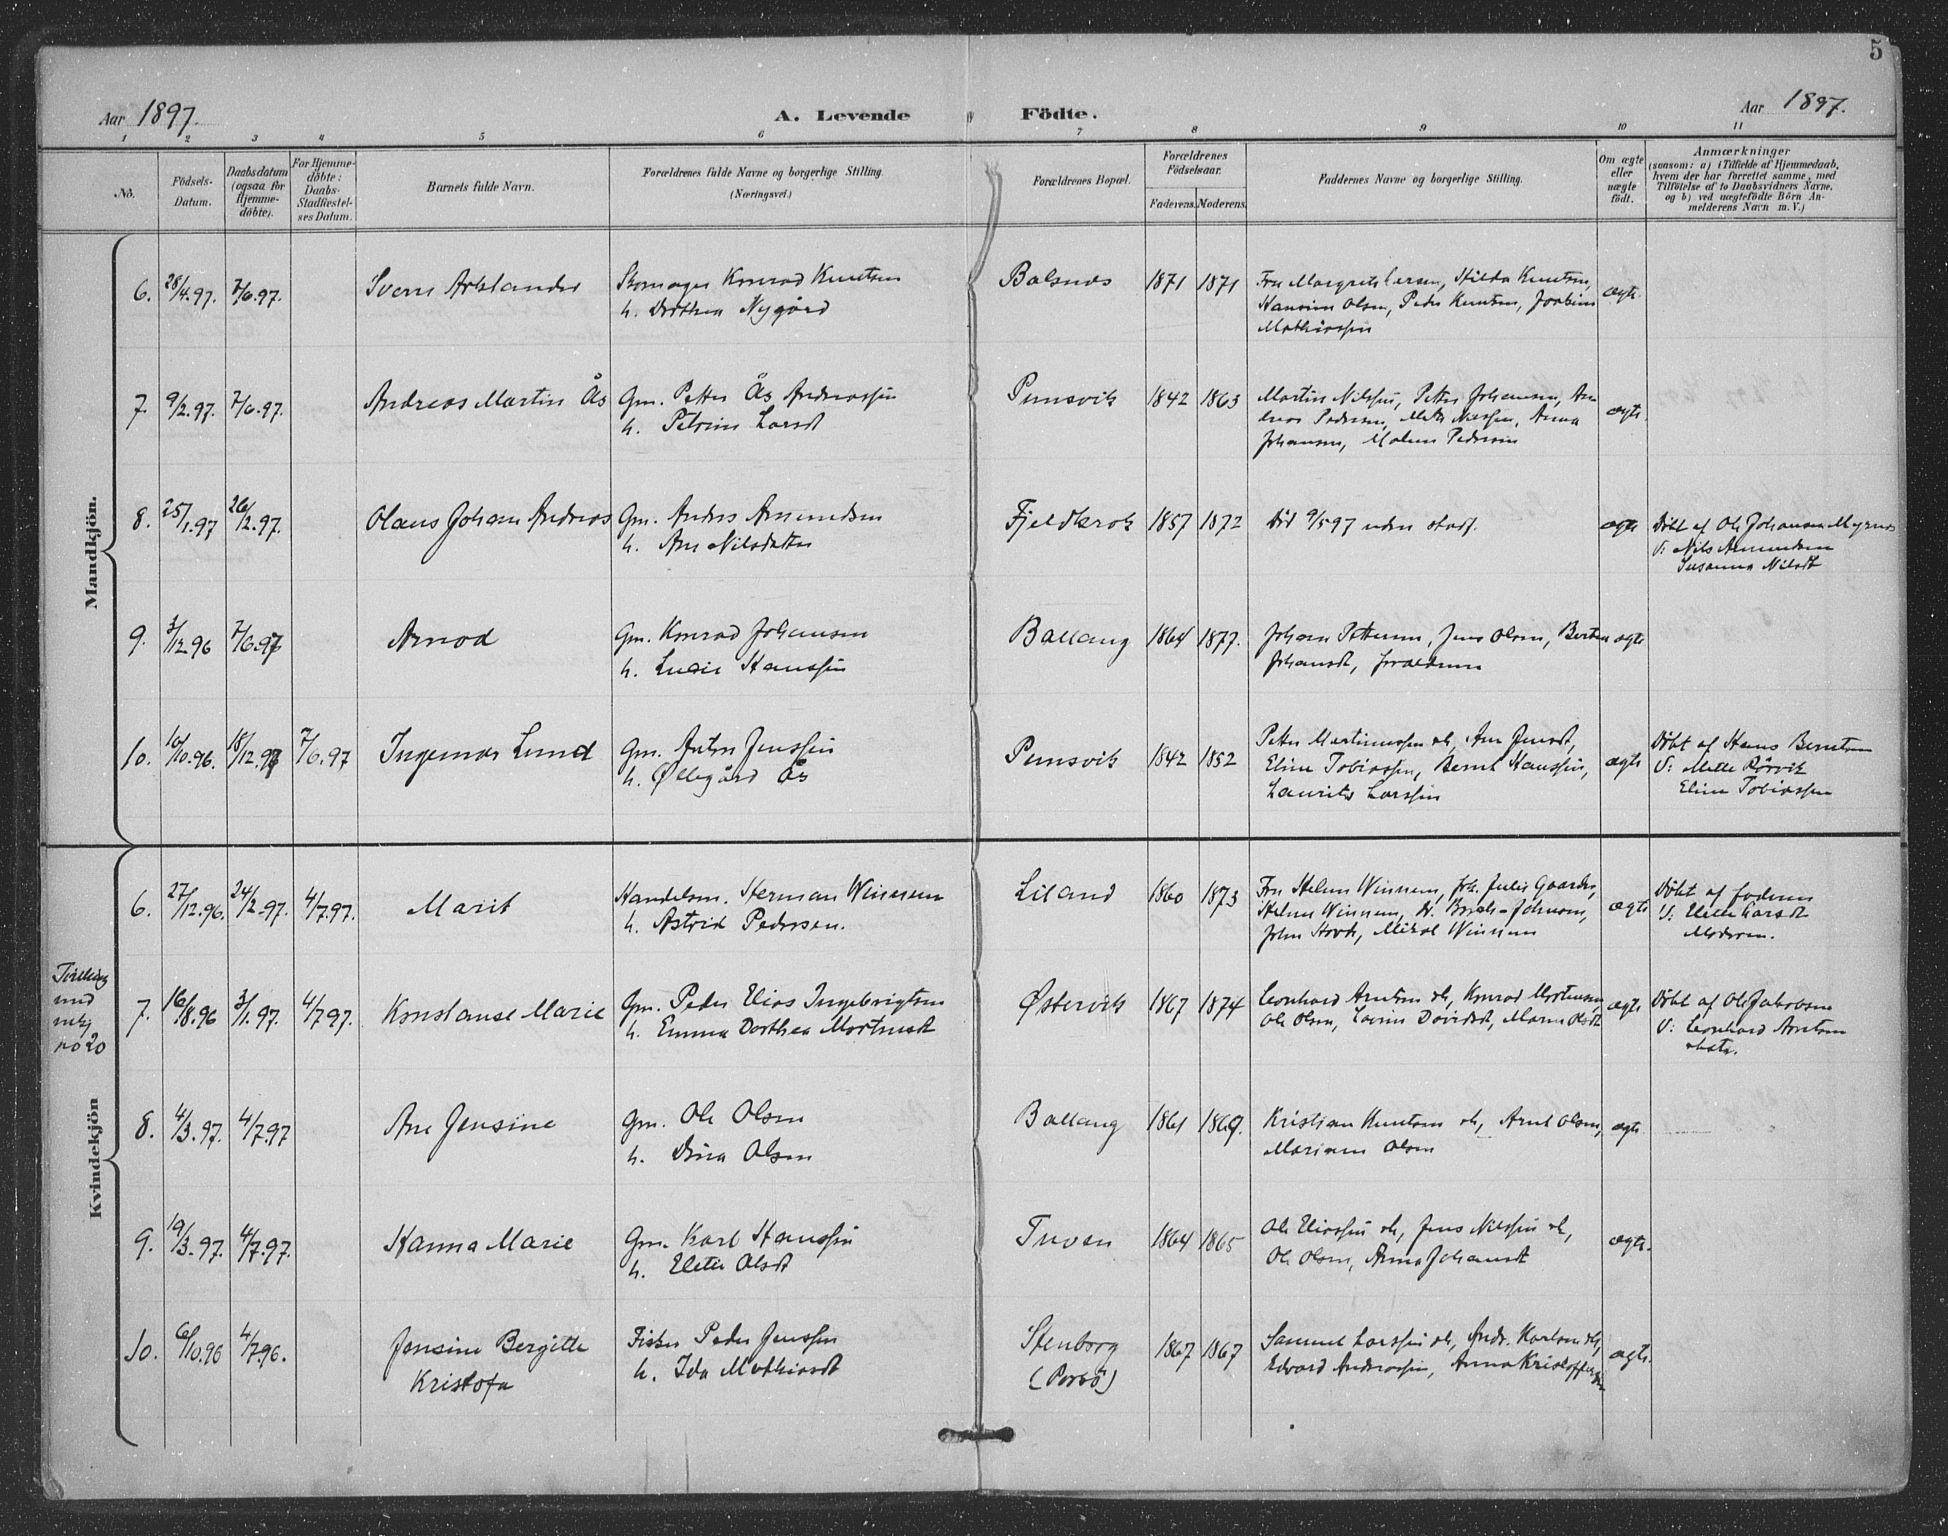 SAT, Ministerialprotokoller, klokkerbøker og fødselsregistre - Nordland, 863/L0899: Ministerialbok nr. 863A11, 1897-1906, s. 5